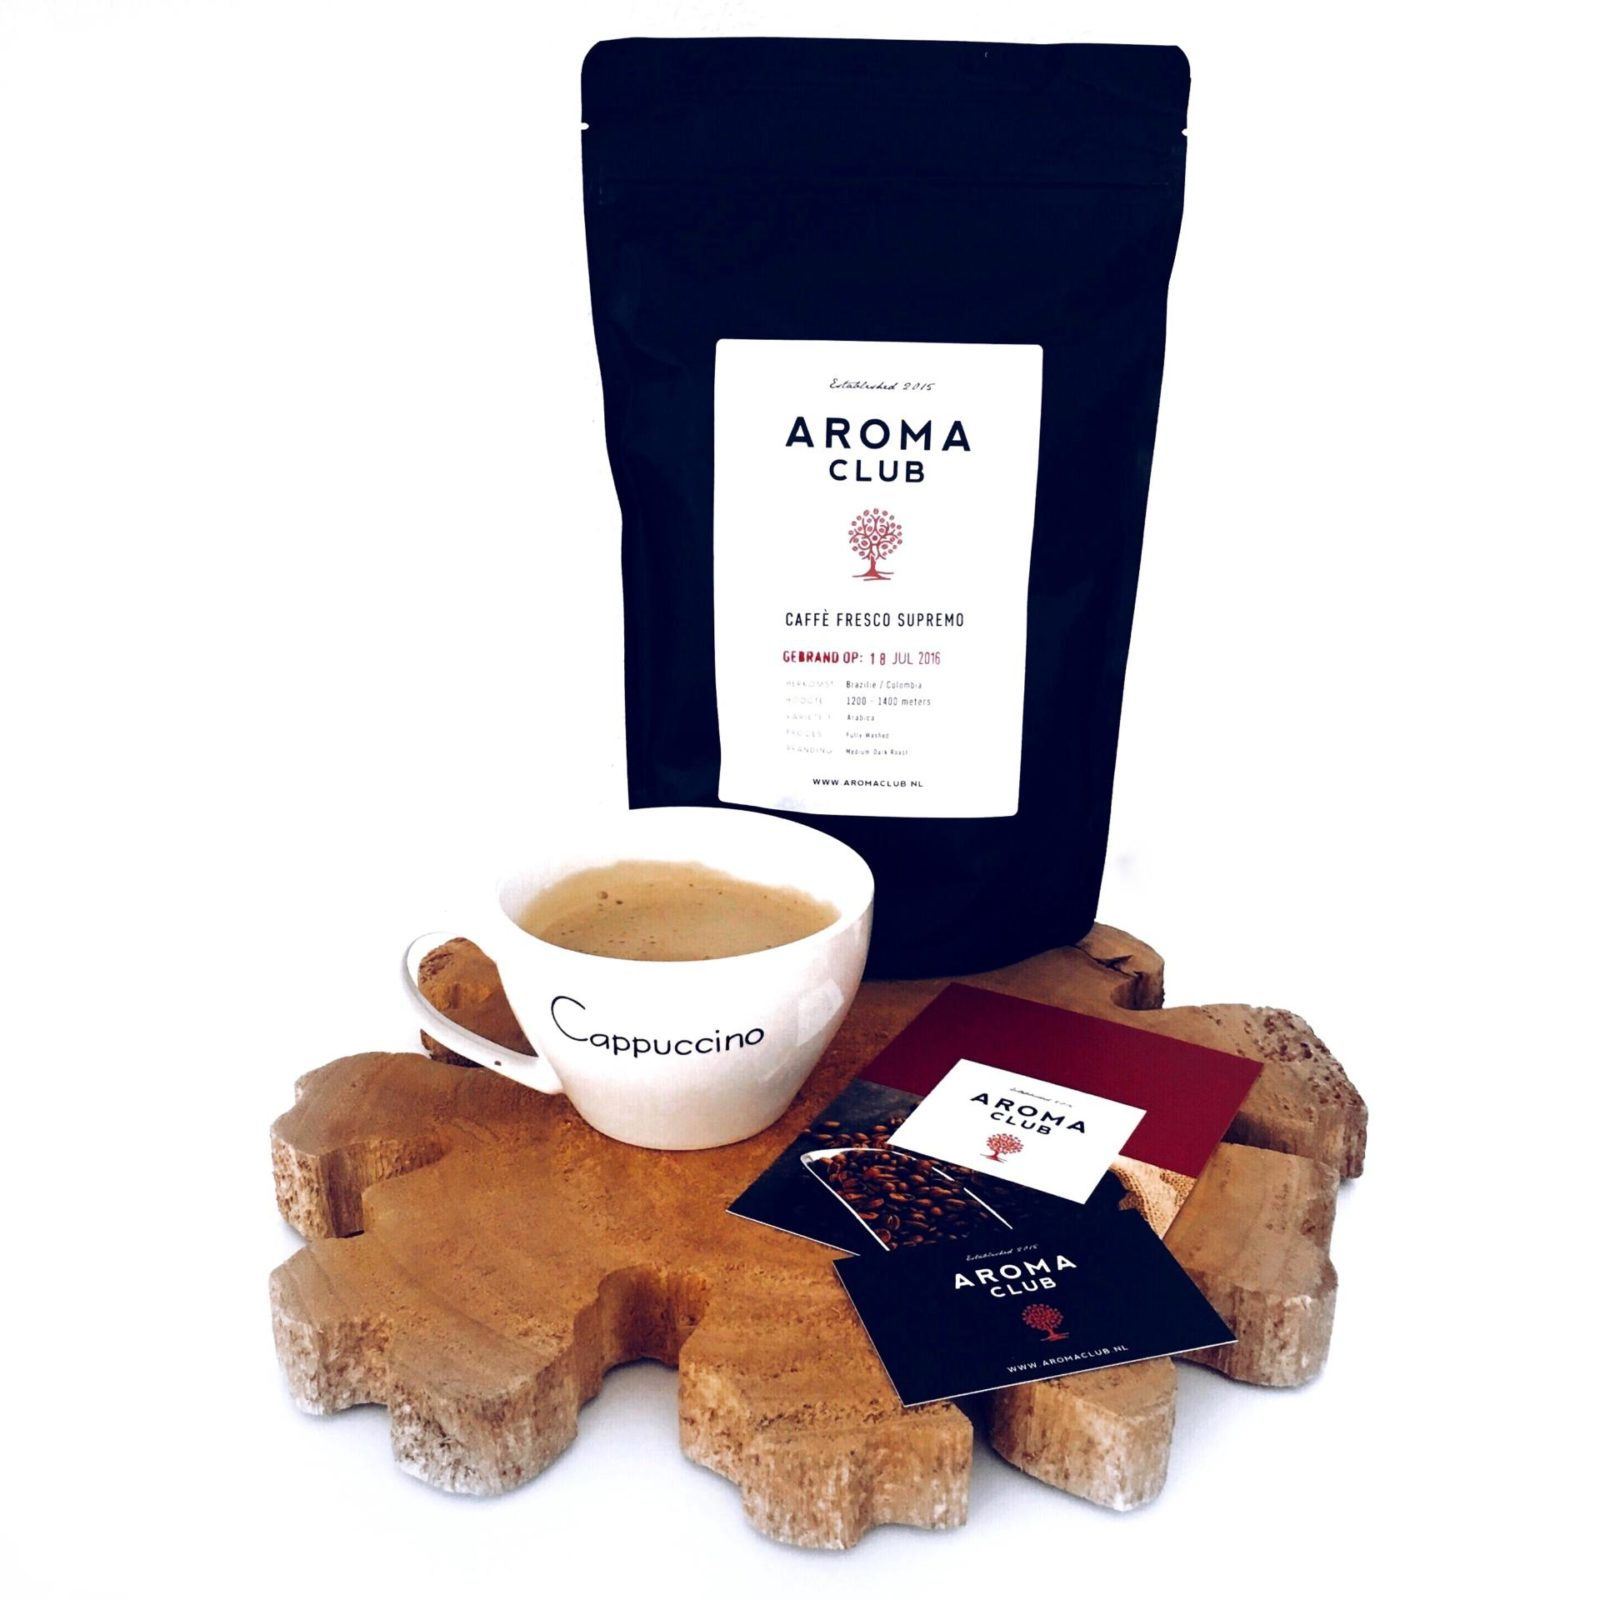 The Aroma Club coffee